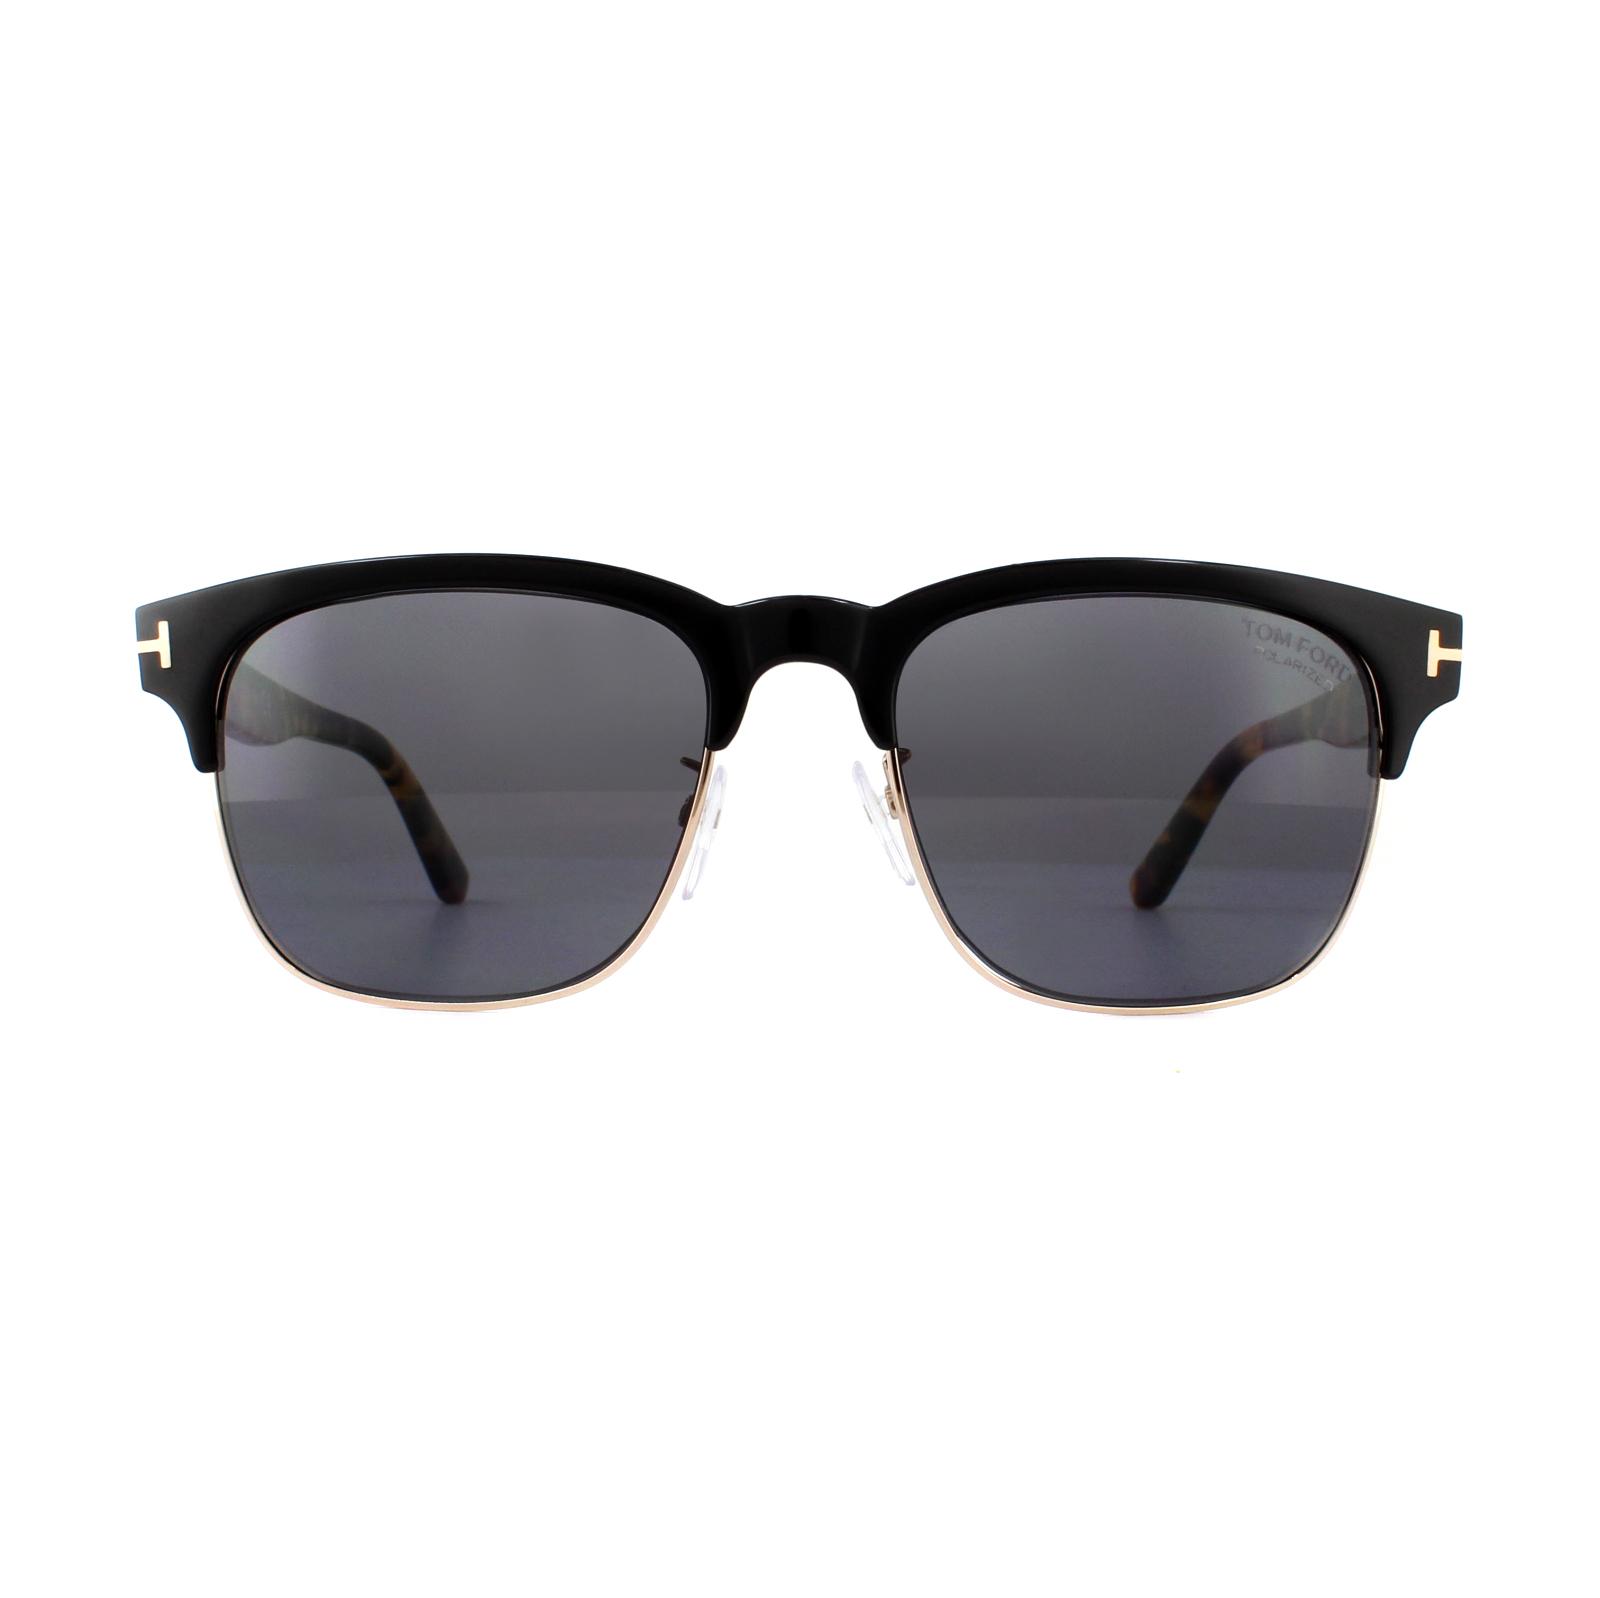 1545e8379d9 Sentinel Tom Ford Sunglasses Louis FT0386 01D Black   Havana Grey Polarized